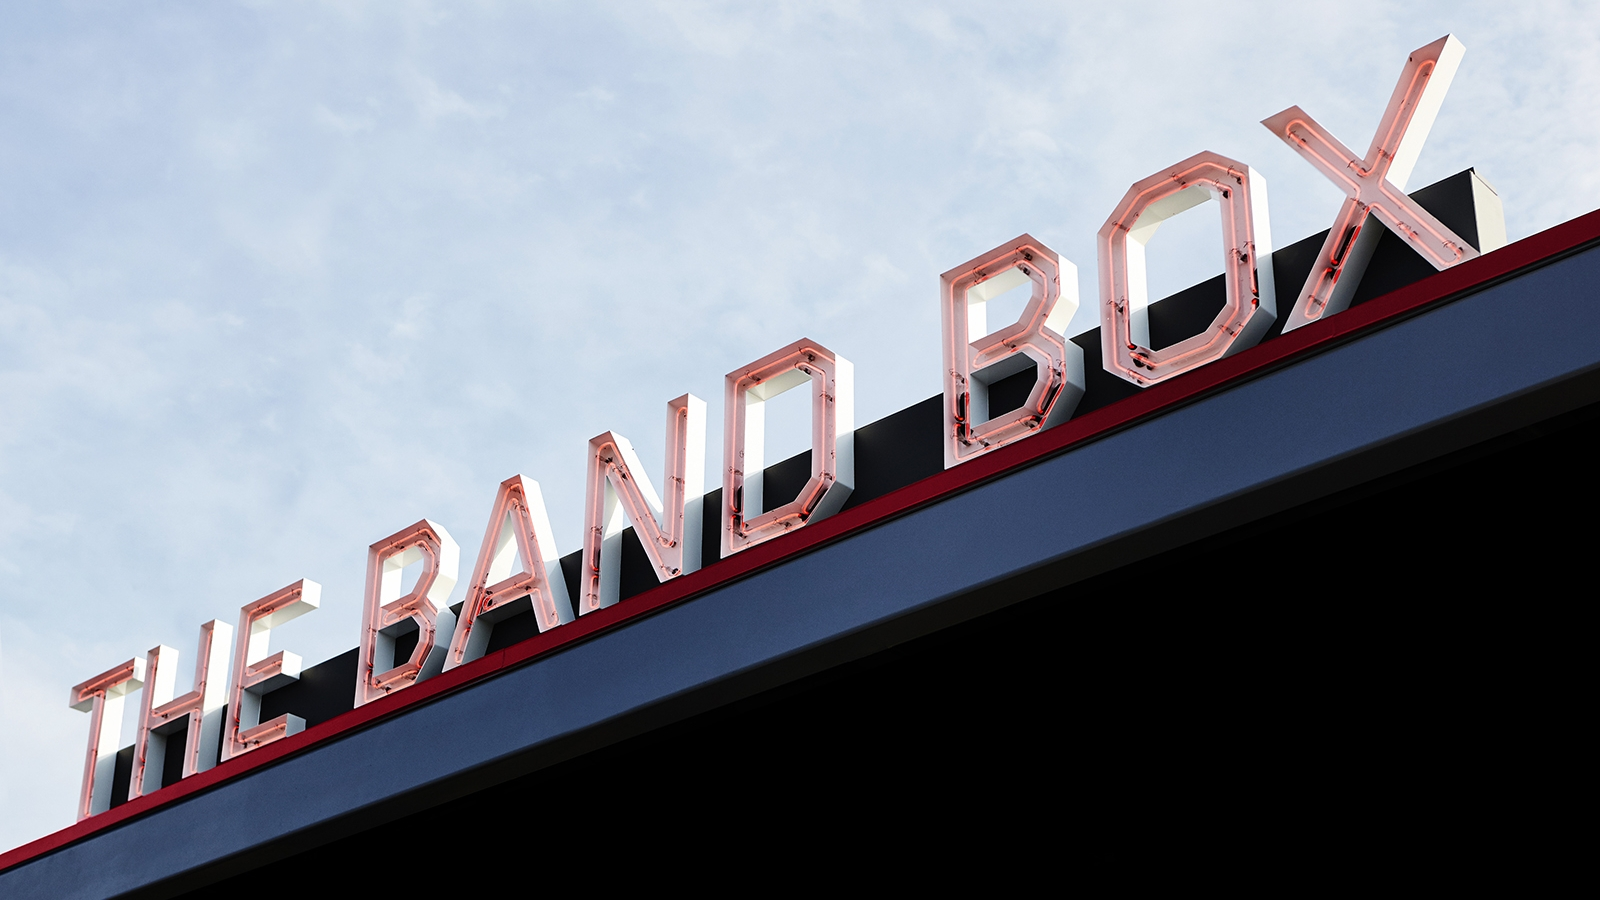 MH_BandBox_0492_FINAL.jpg